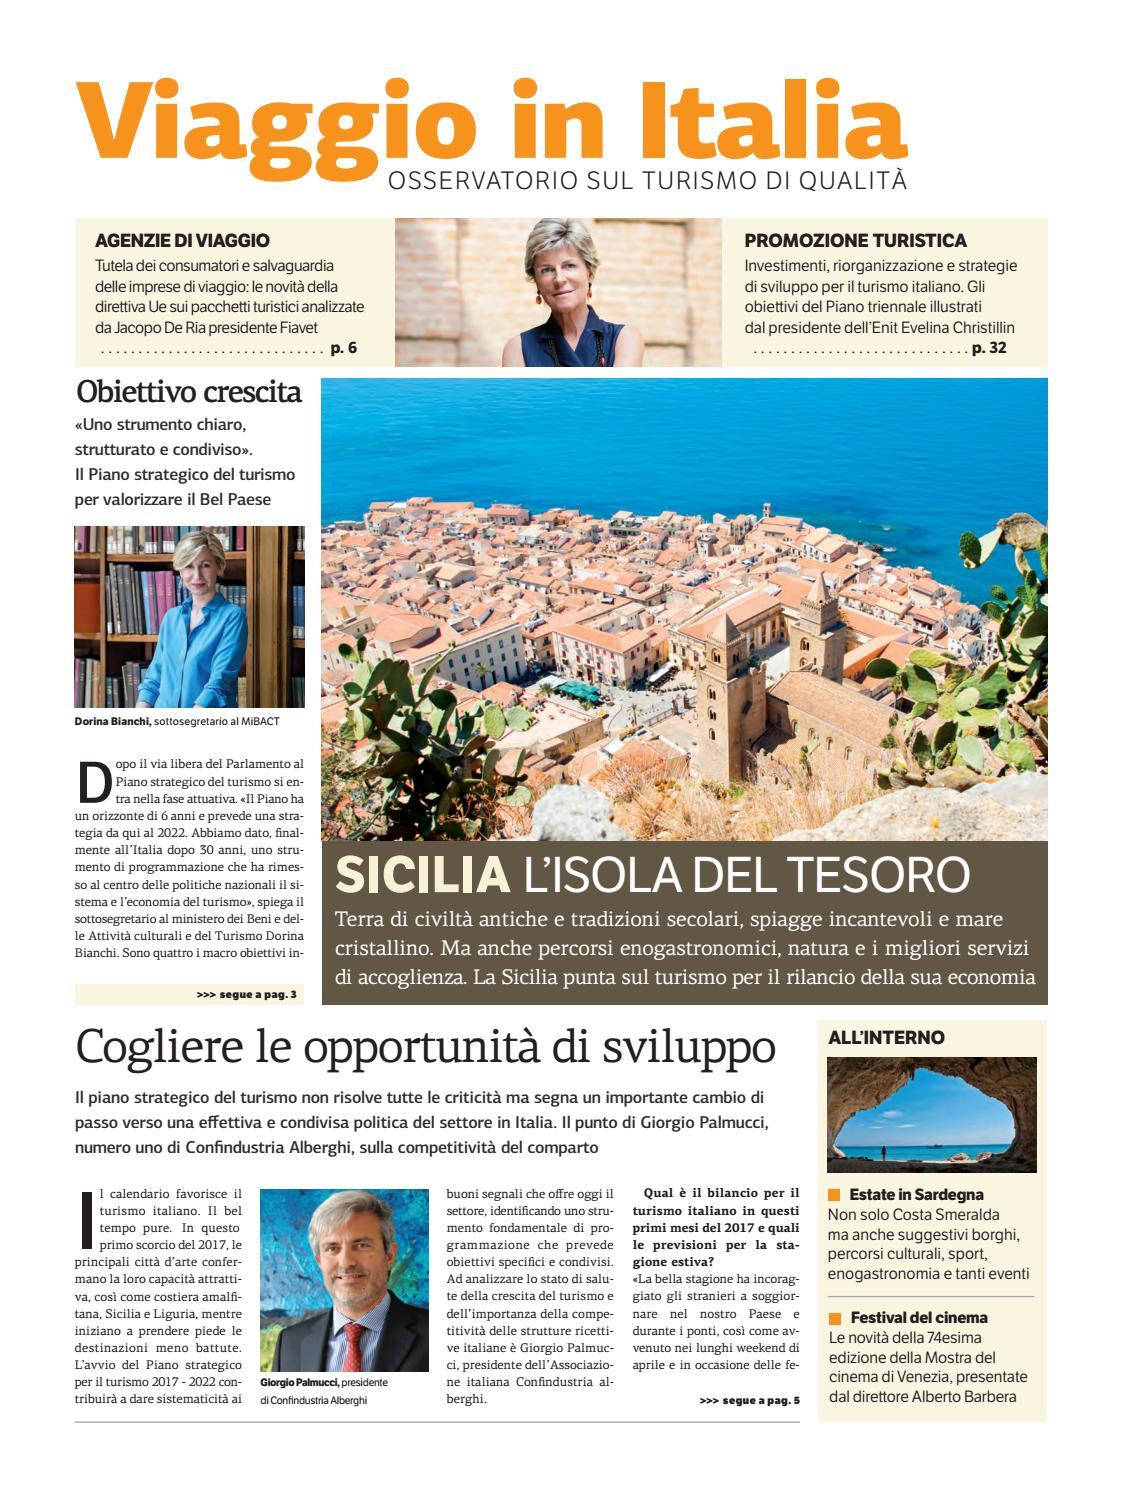 Calendario Contadine Italiane.Viaggi Giugno 17 By Golfarelli Editore International Group